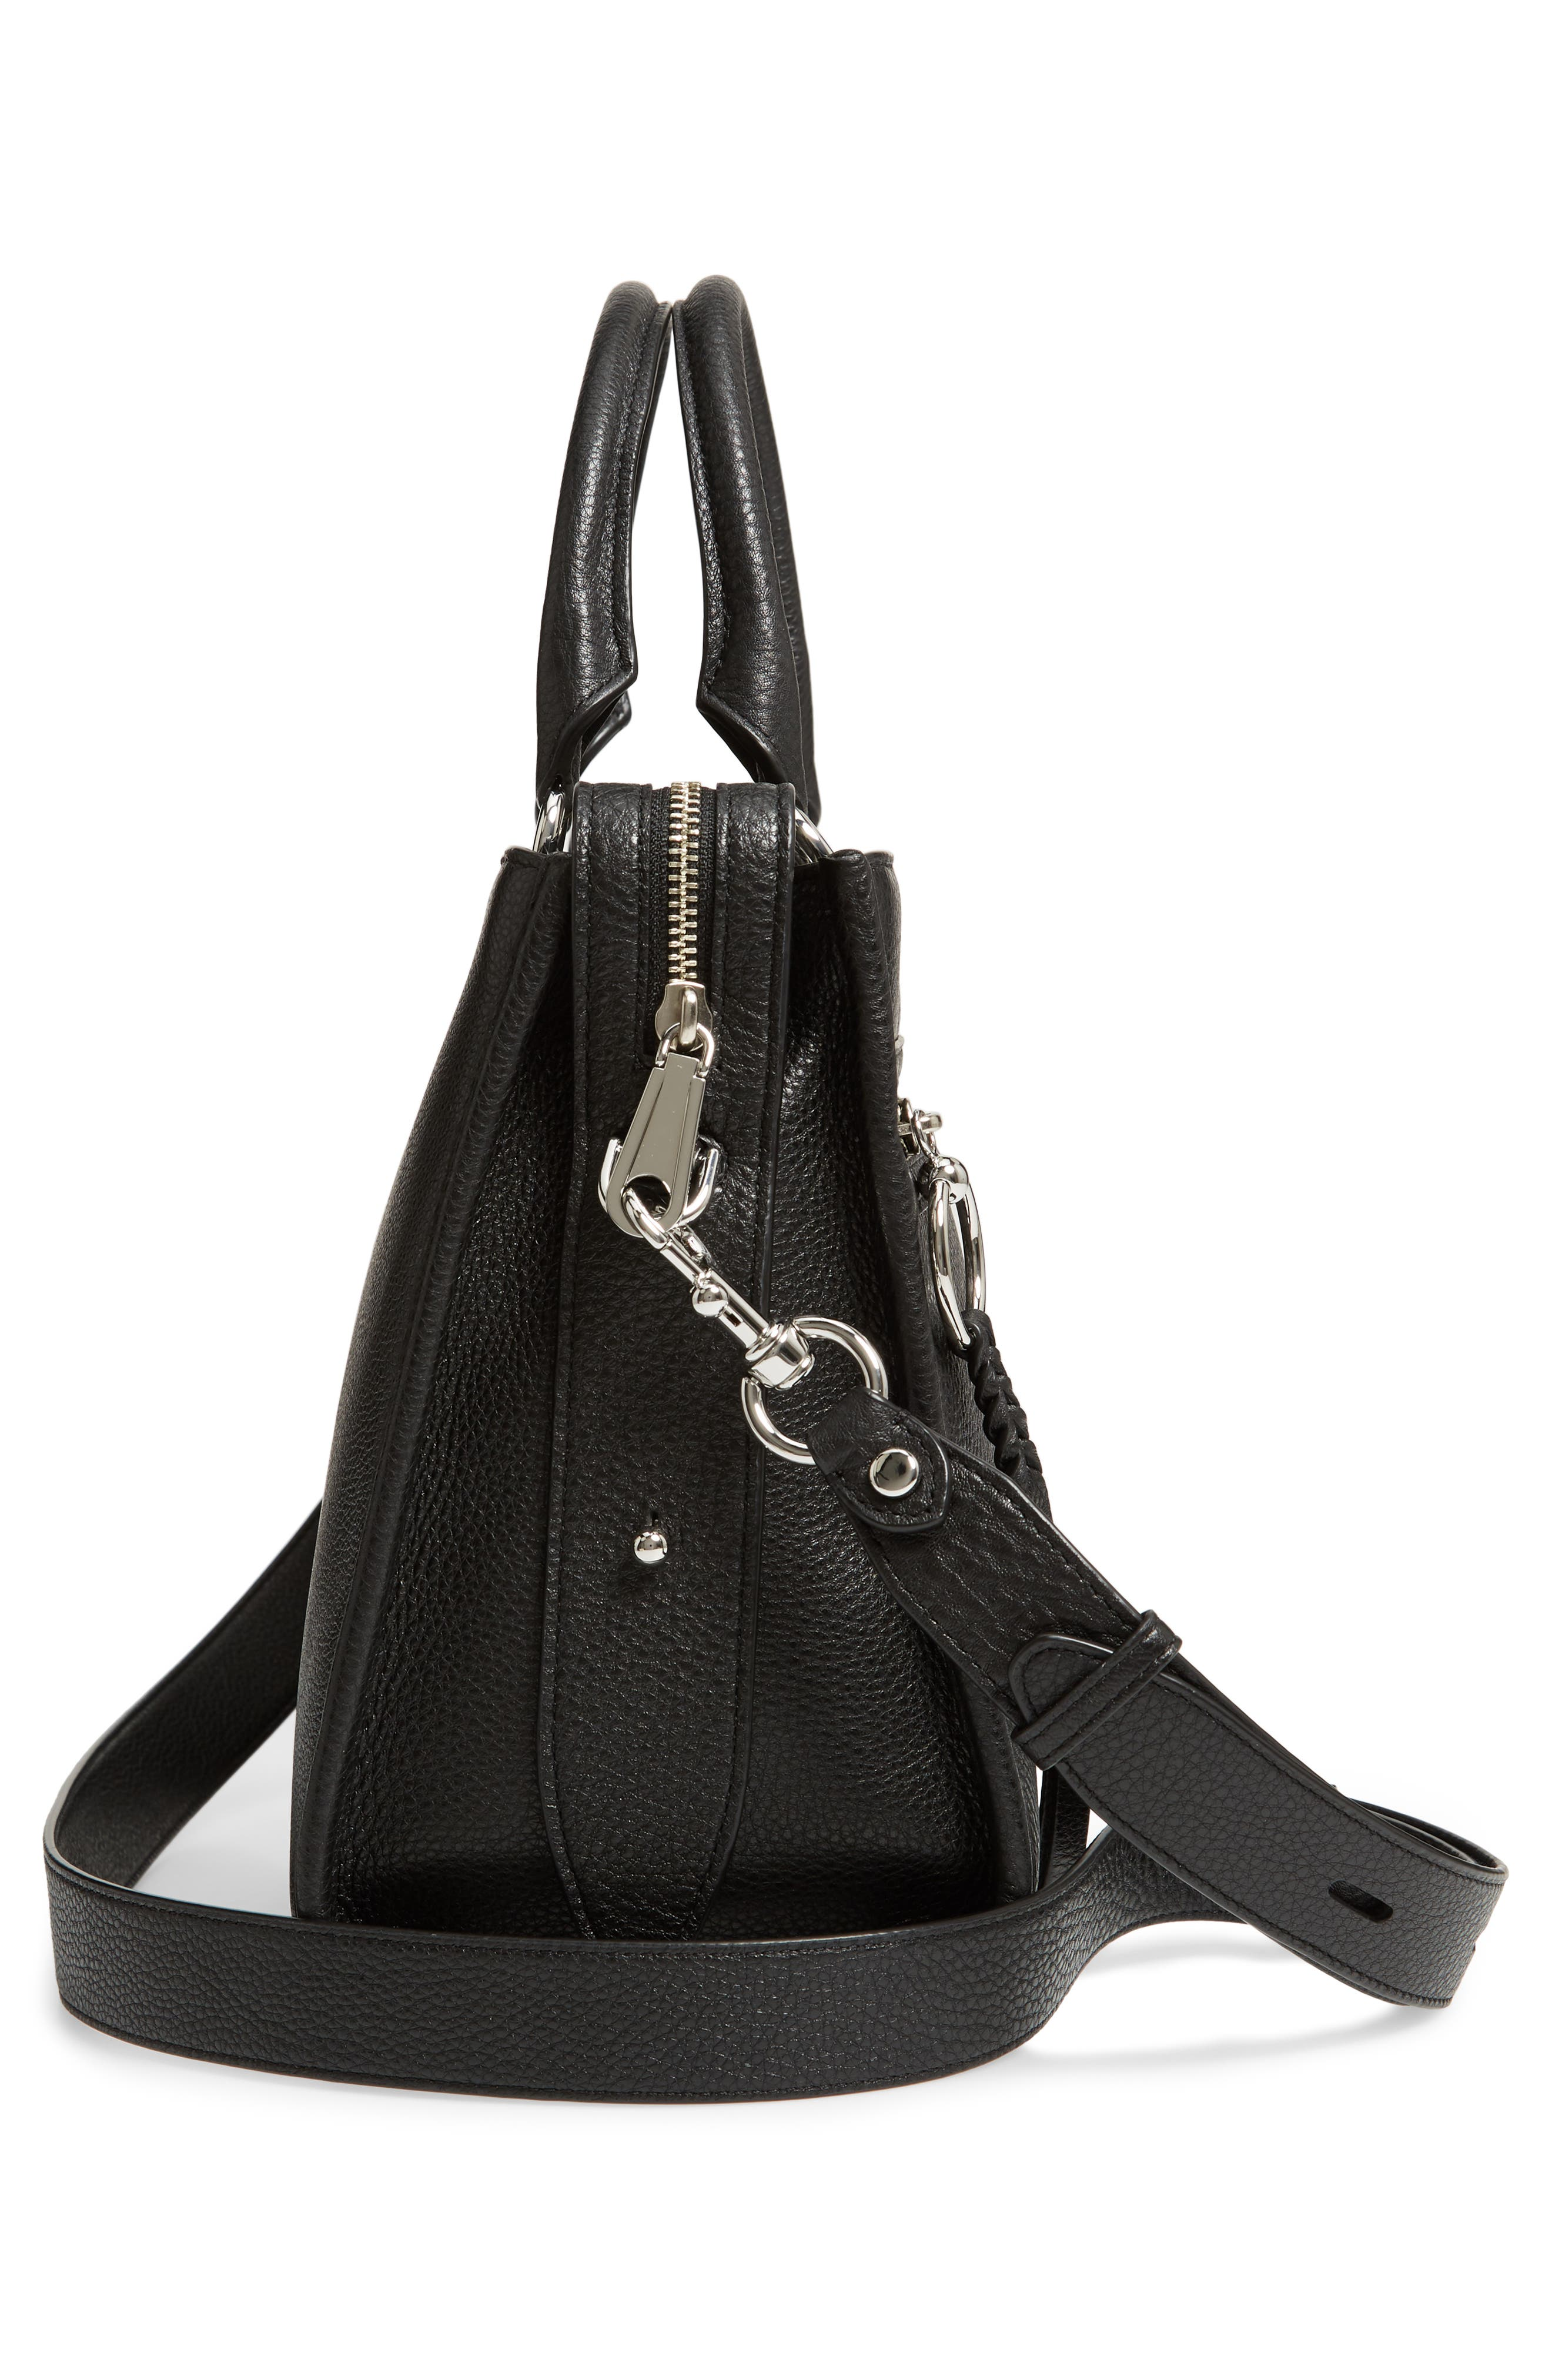 REBECCA MINKOFF, Bedford Zip Leather Satchel, Alternate thumbnail 6, color, BLACK